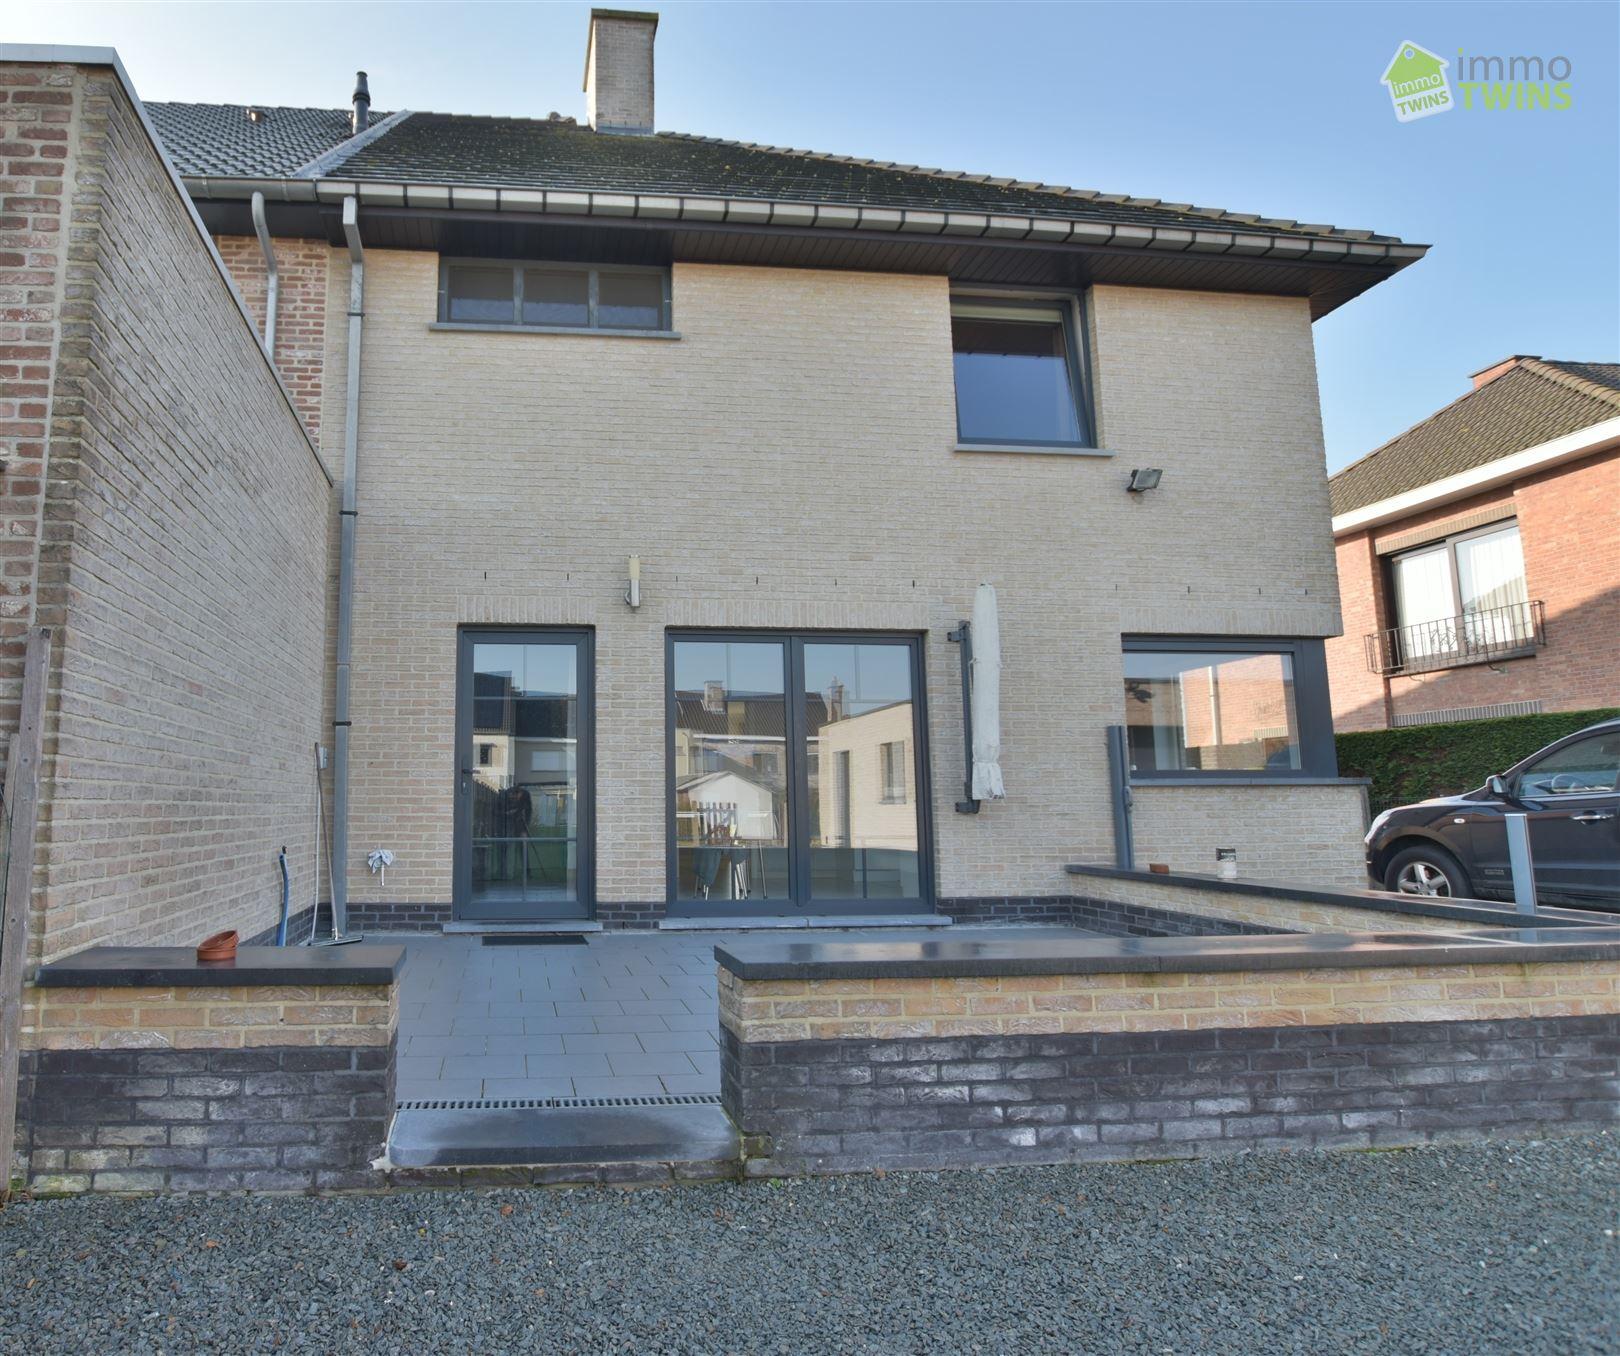 Foto 26 : Woning te 9260 WICHELEN (België) - Prijs € 359.000